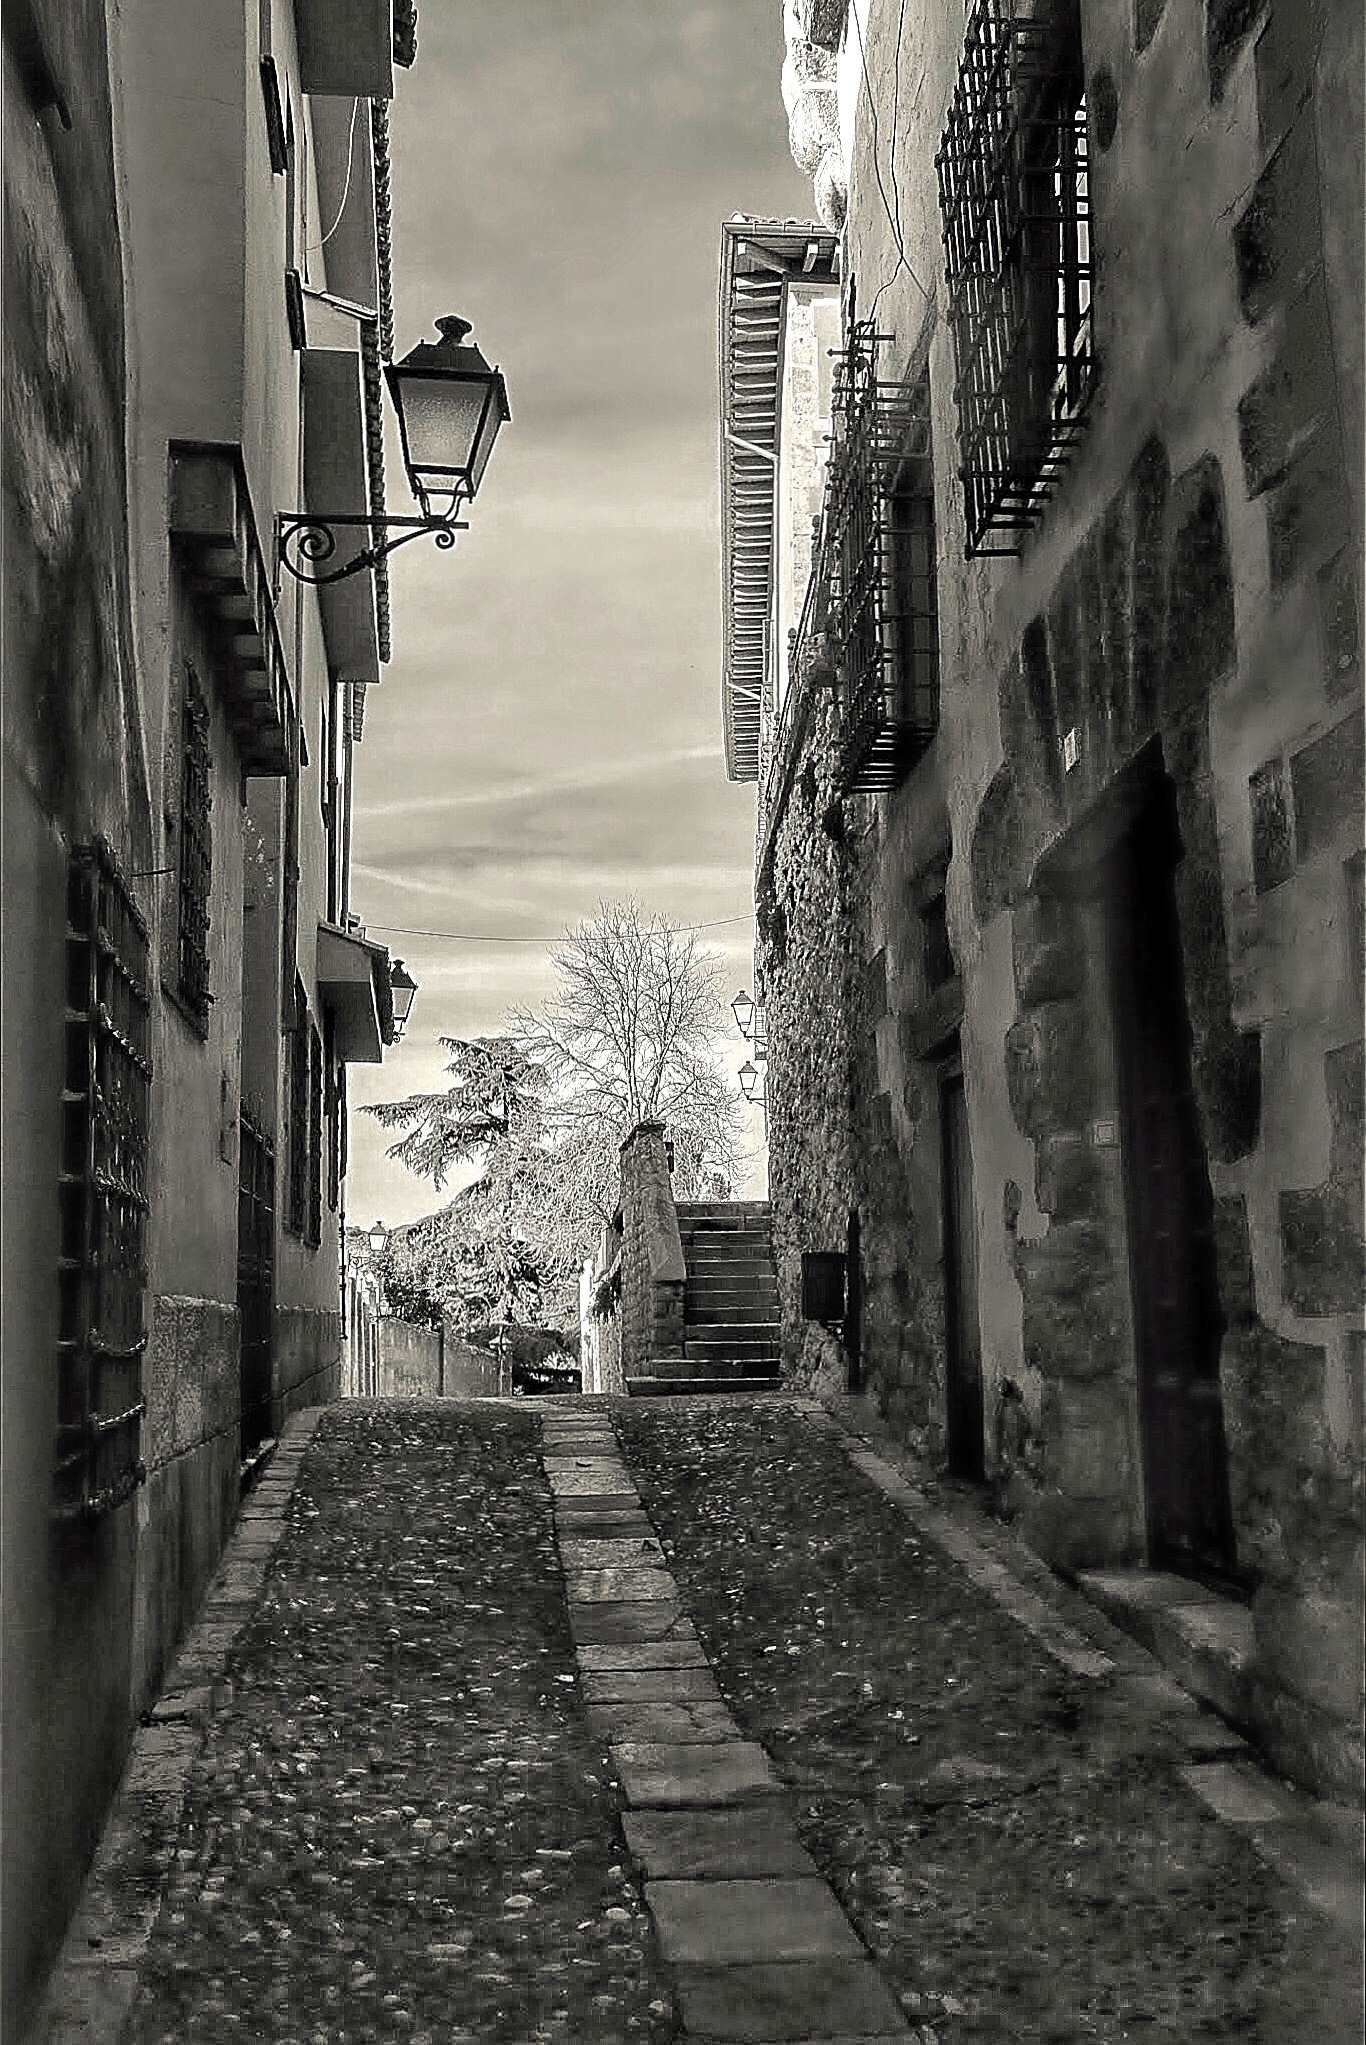 Pilares Street by Gregorio Emper